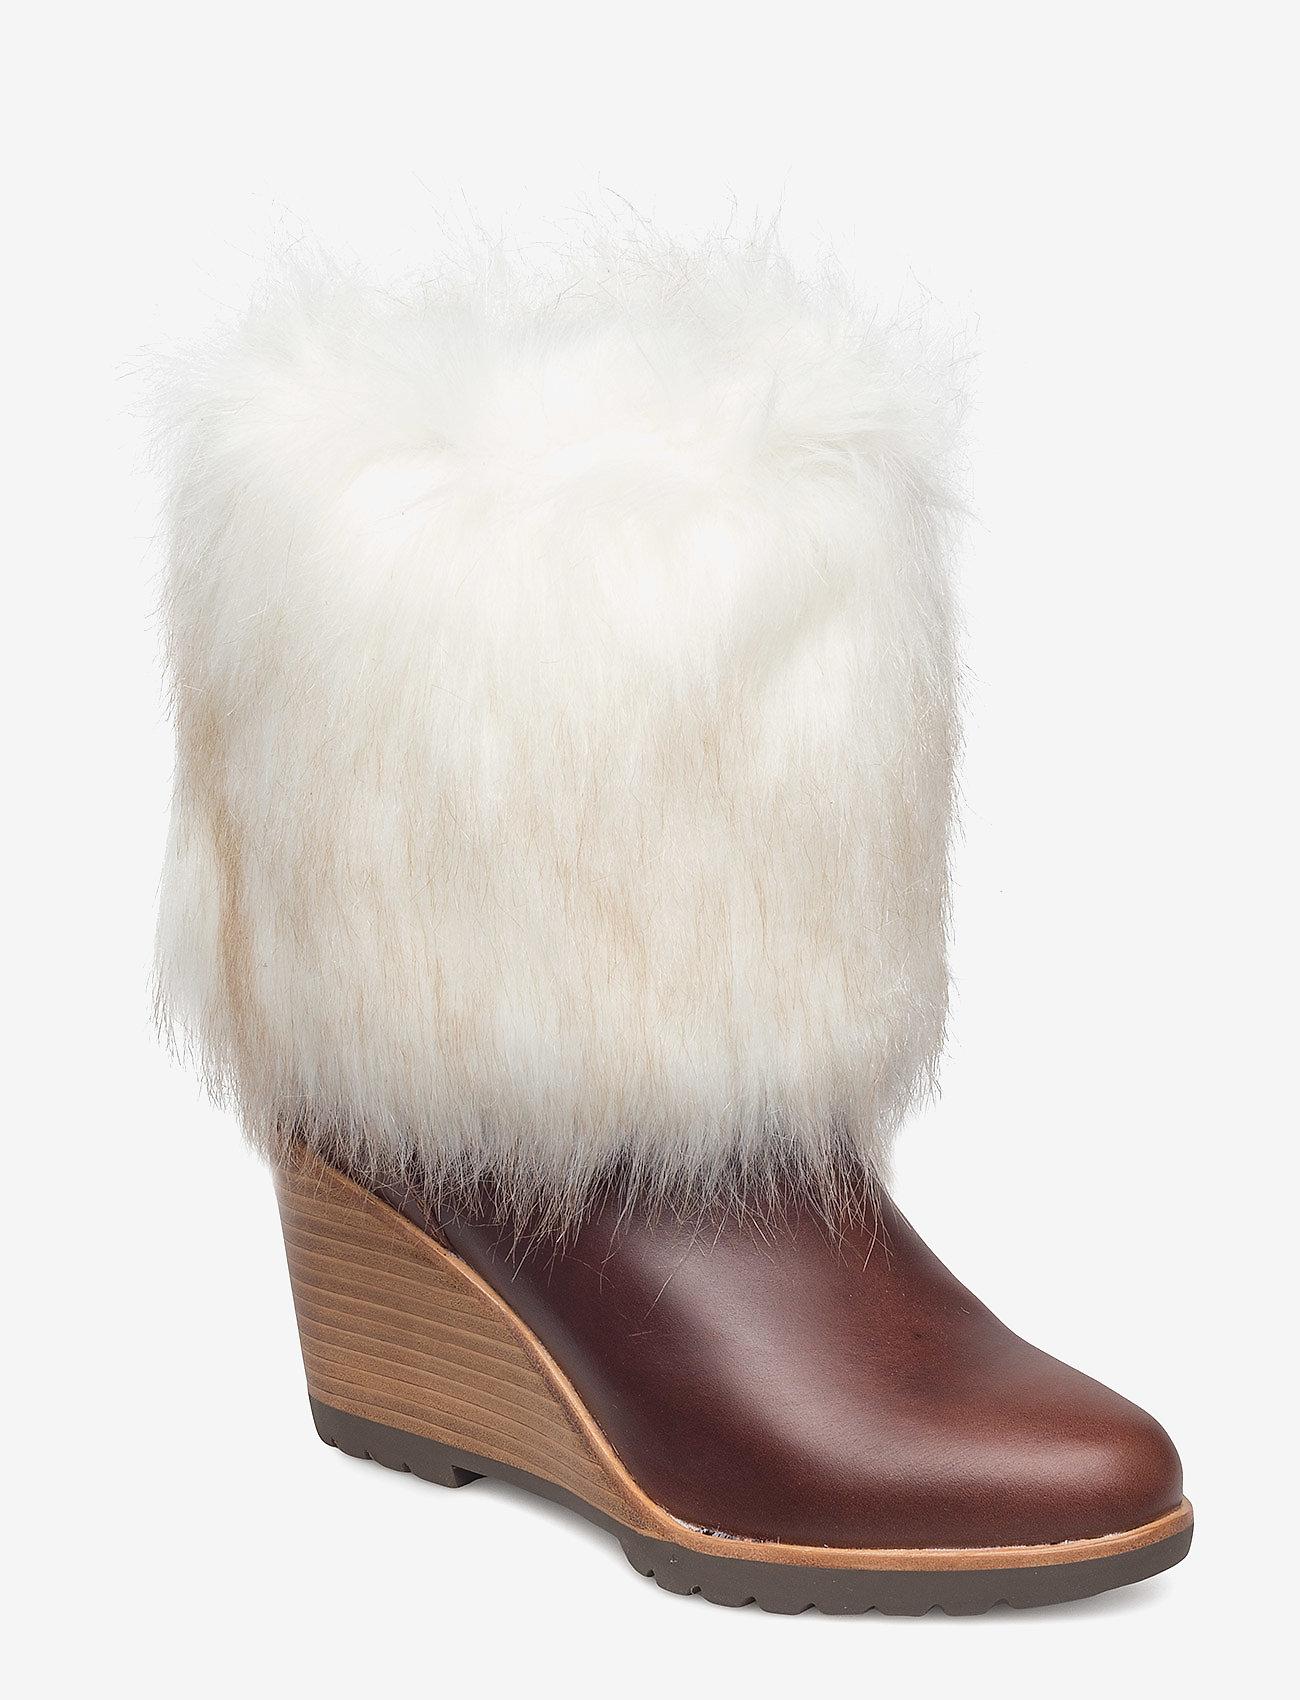 Sorel - PARK CITY SHORT - warm lined boots - elk - 1